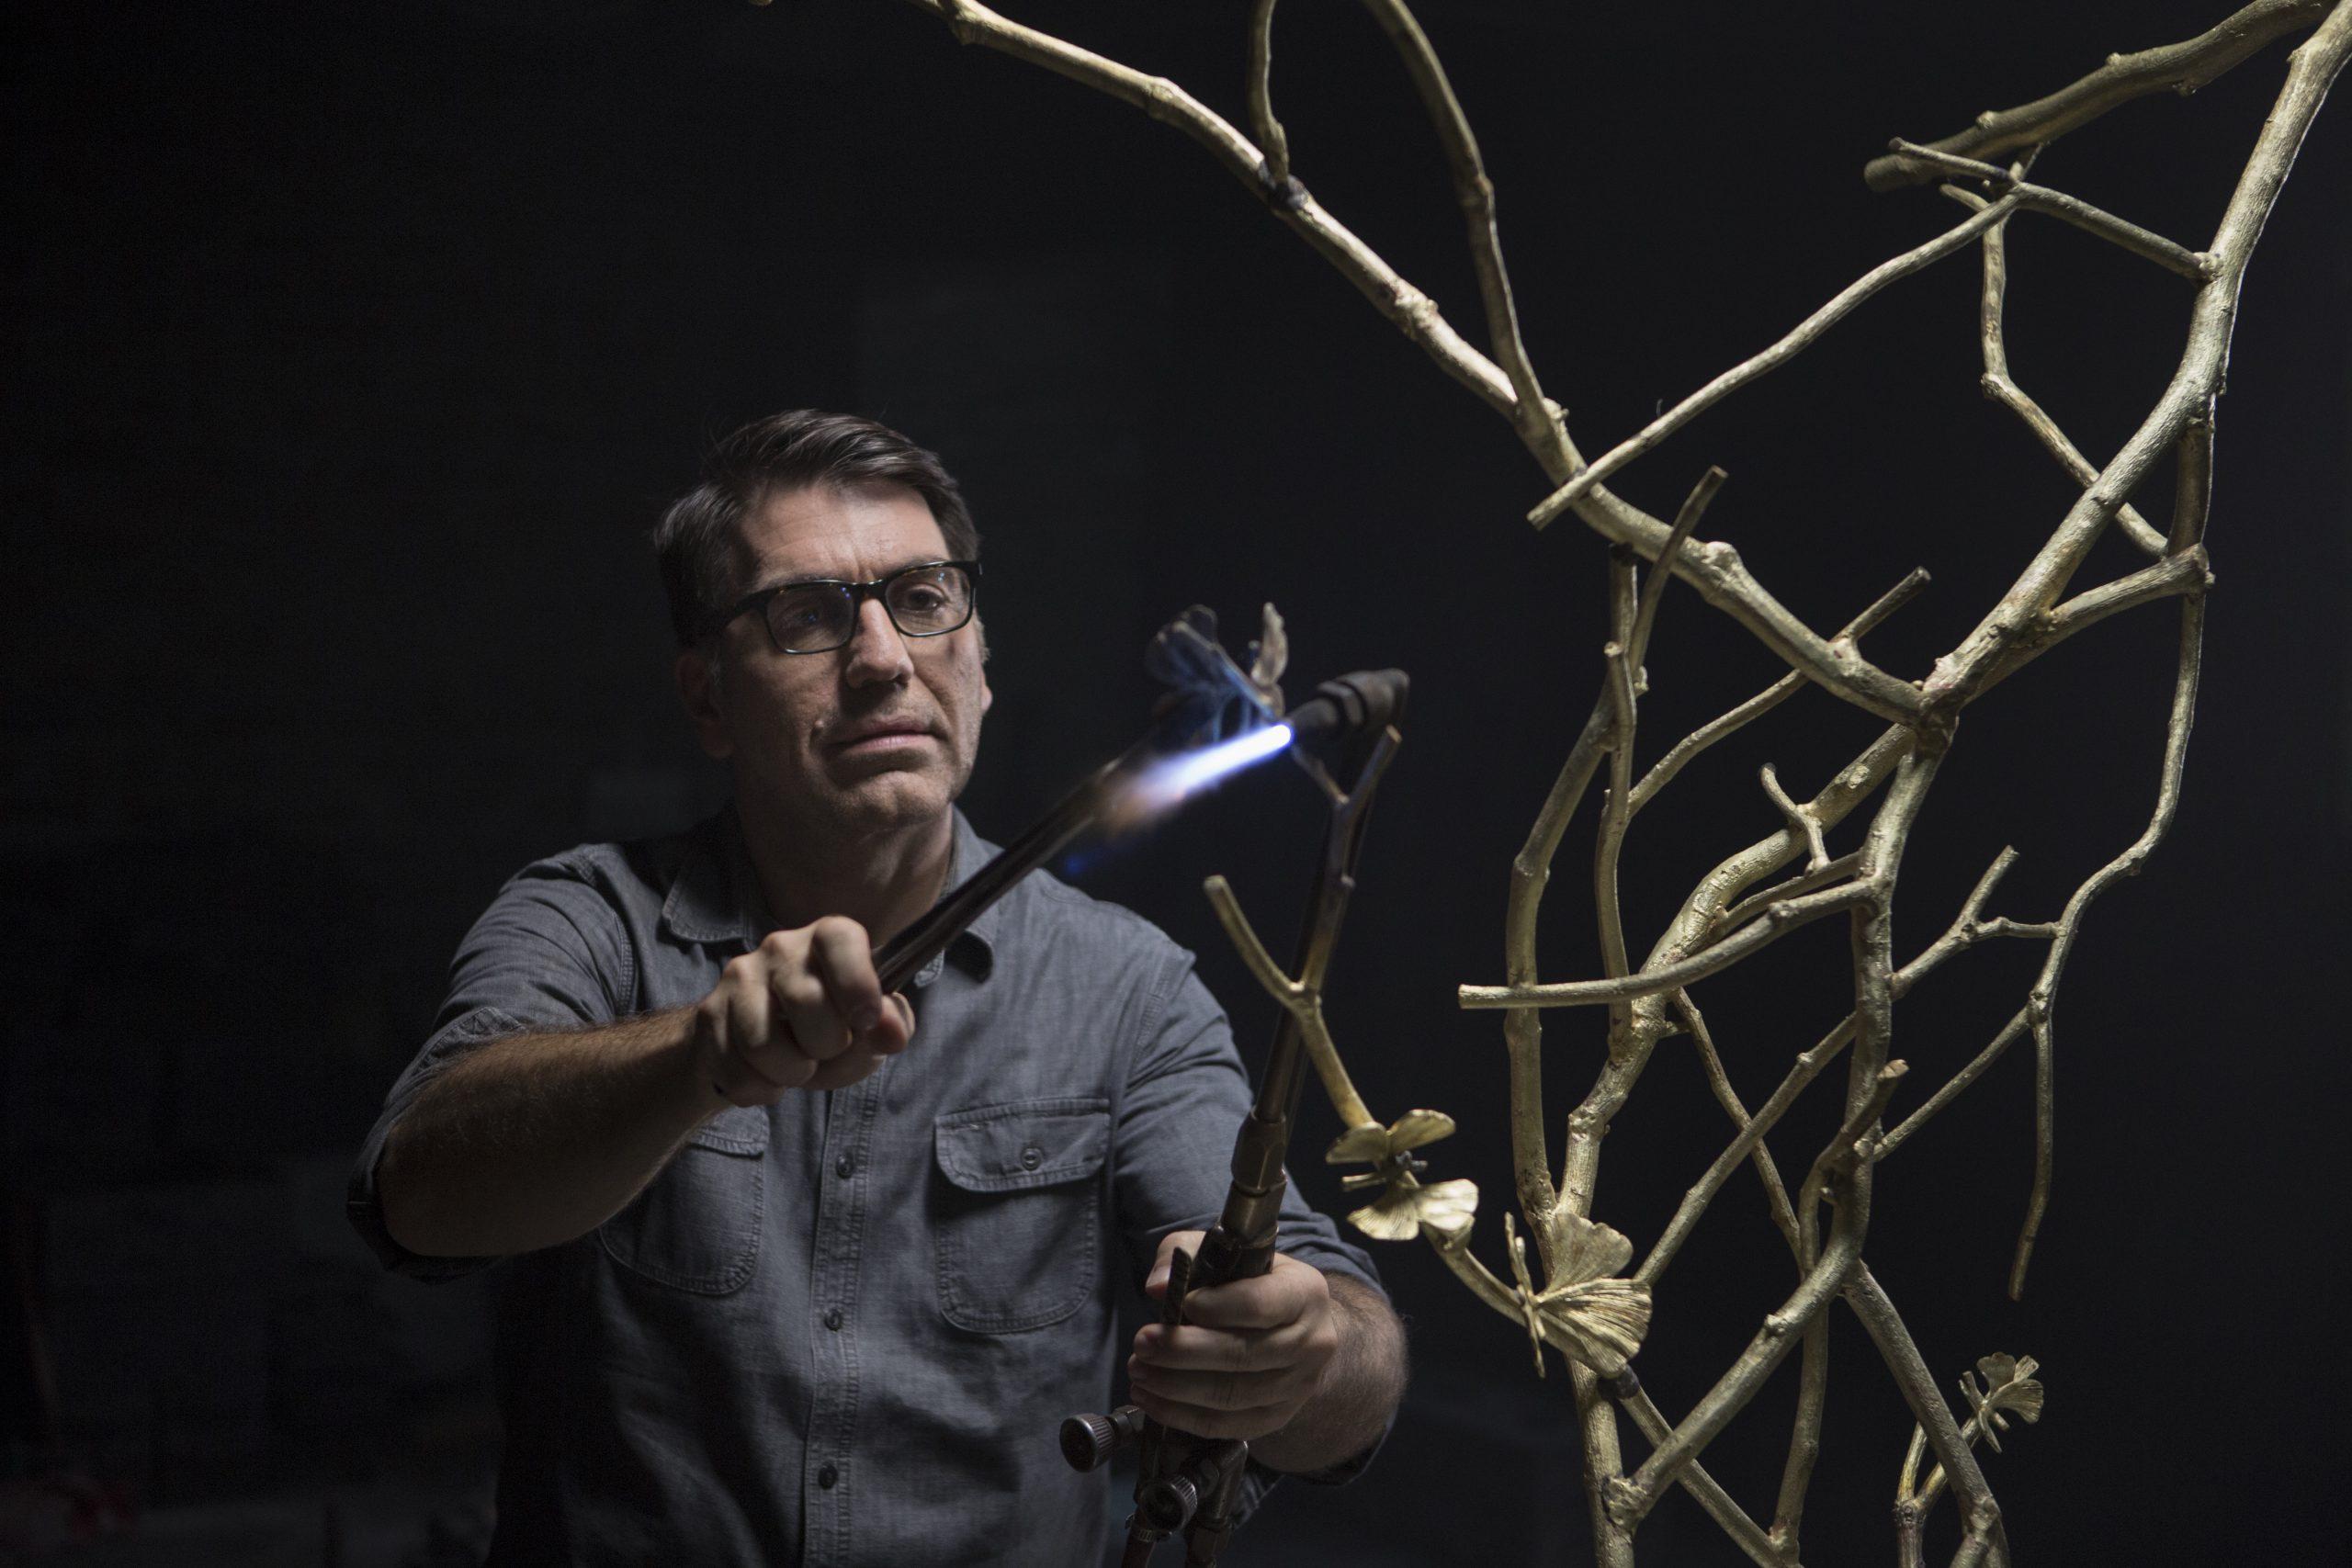 Michael Aram – Welding Branches